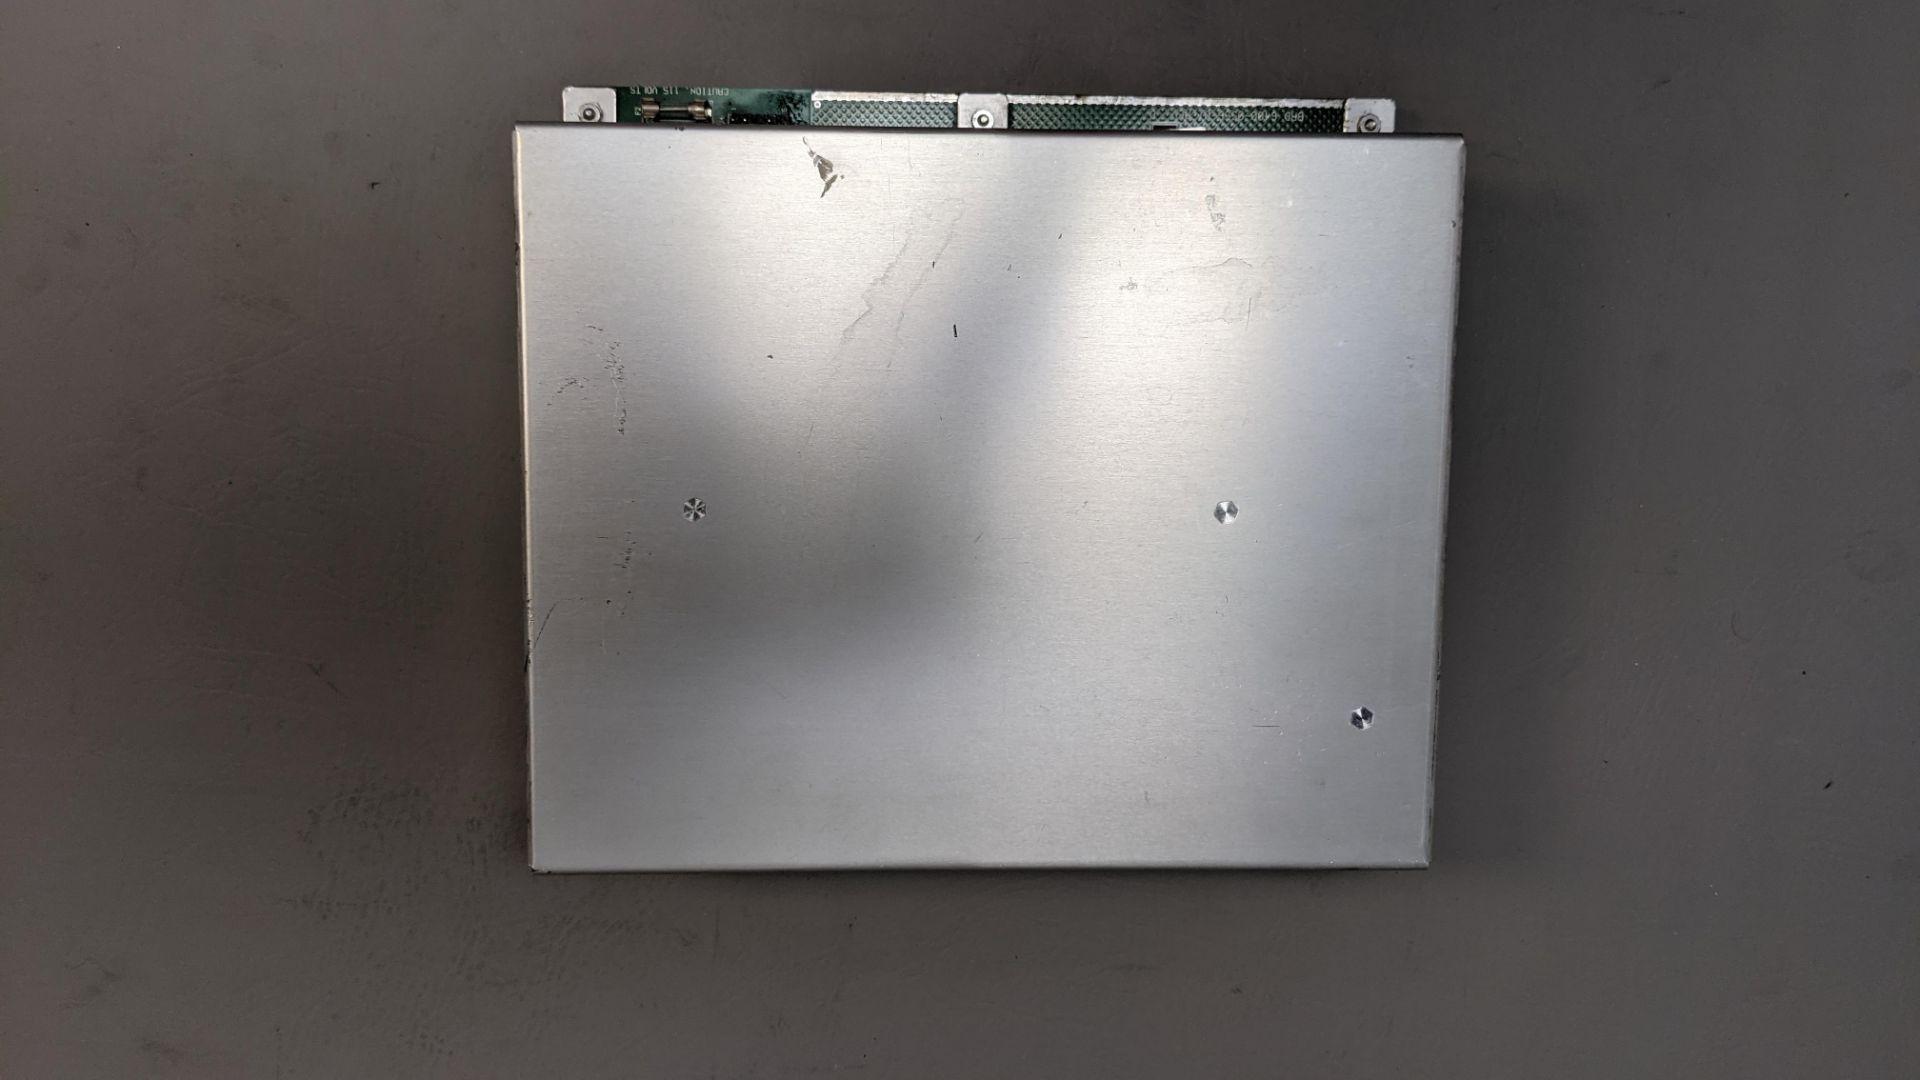 TRANE HVAC MODULE - Image 4 of 4